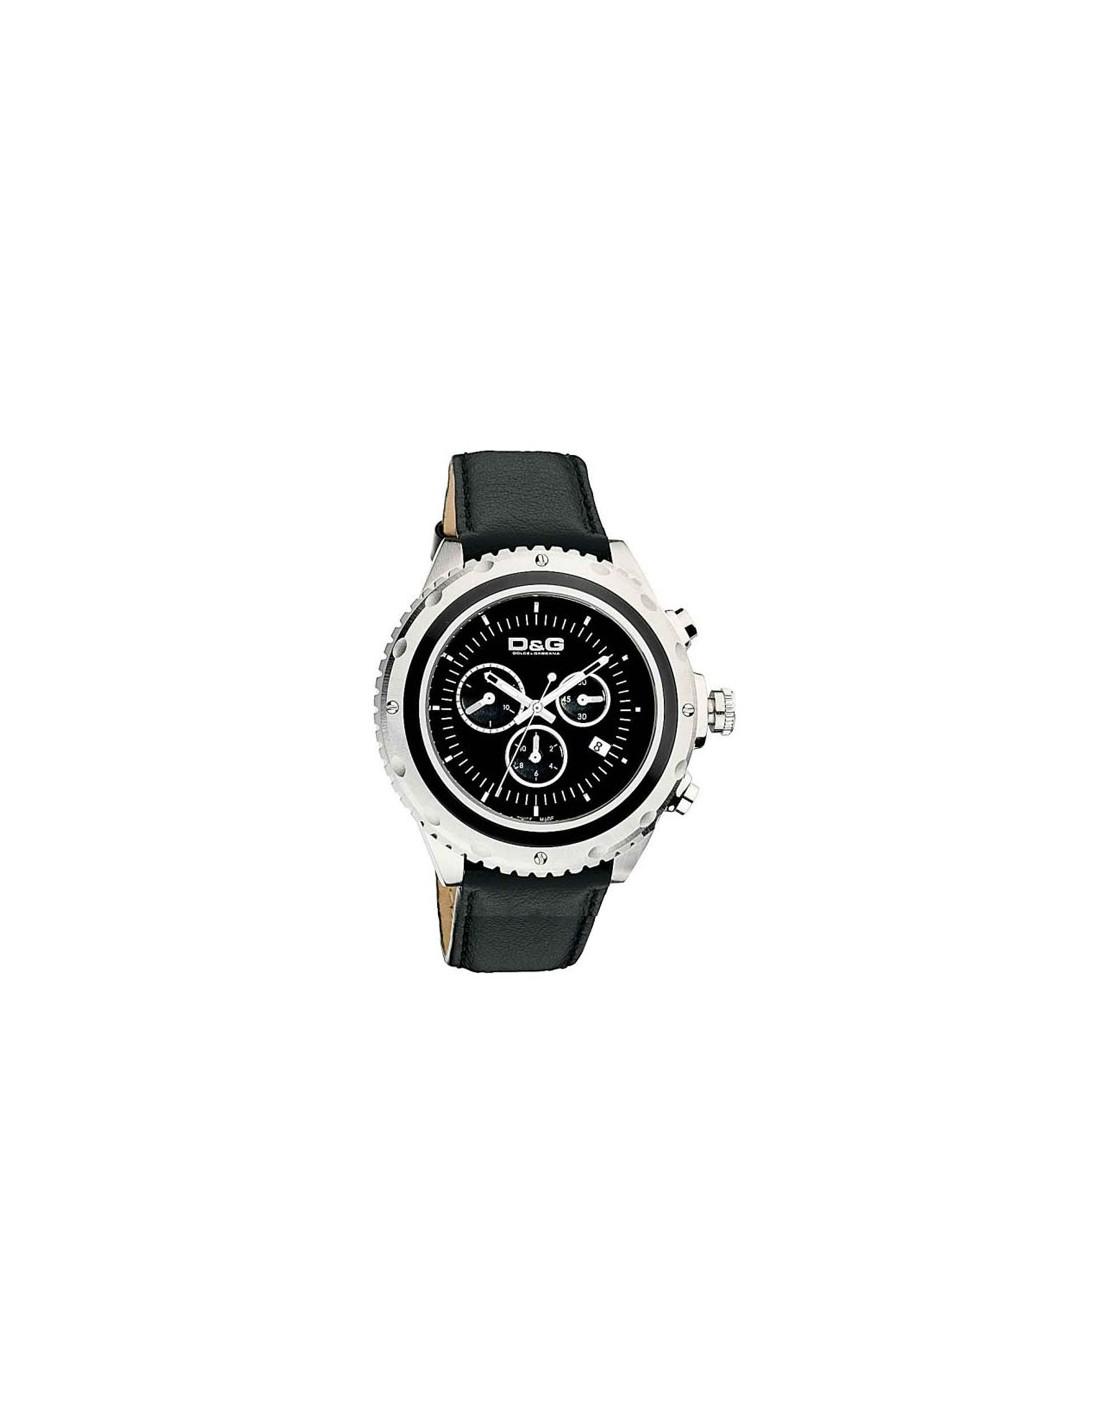 fdf27ff13b DW0367   Dolce Gabbana Watch DW0367 - Dolce Gabbana Watches